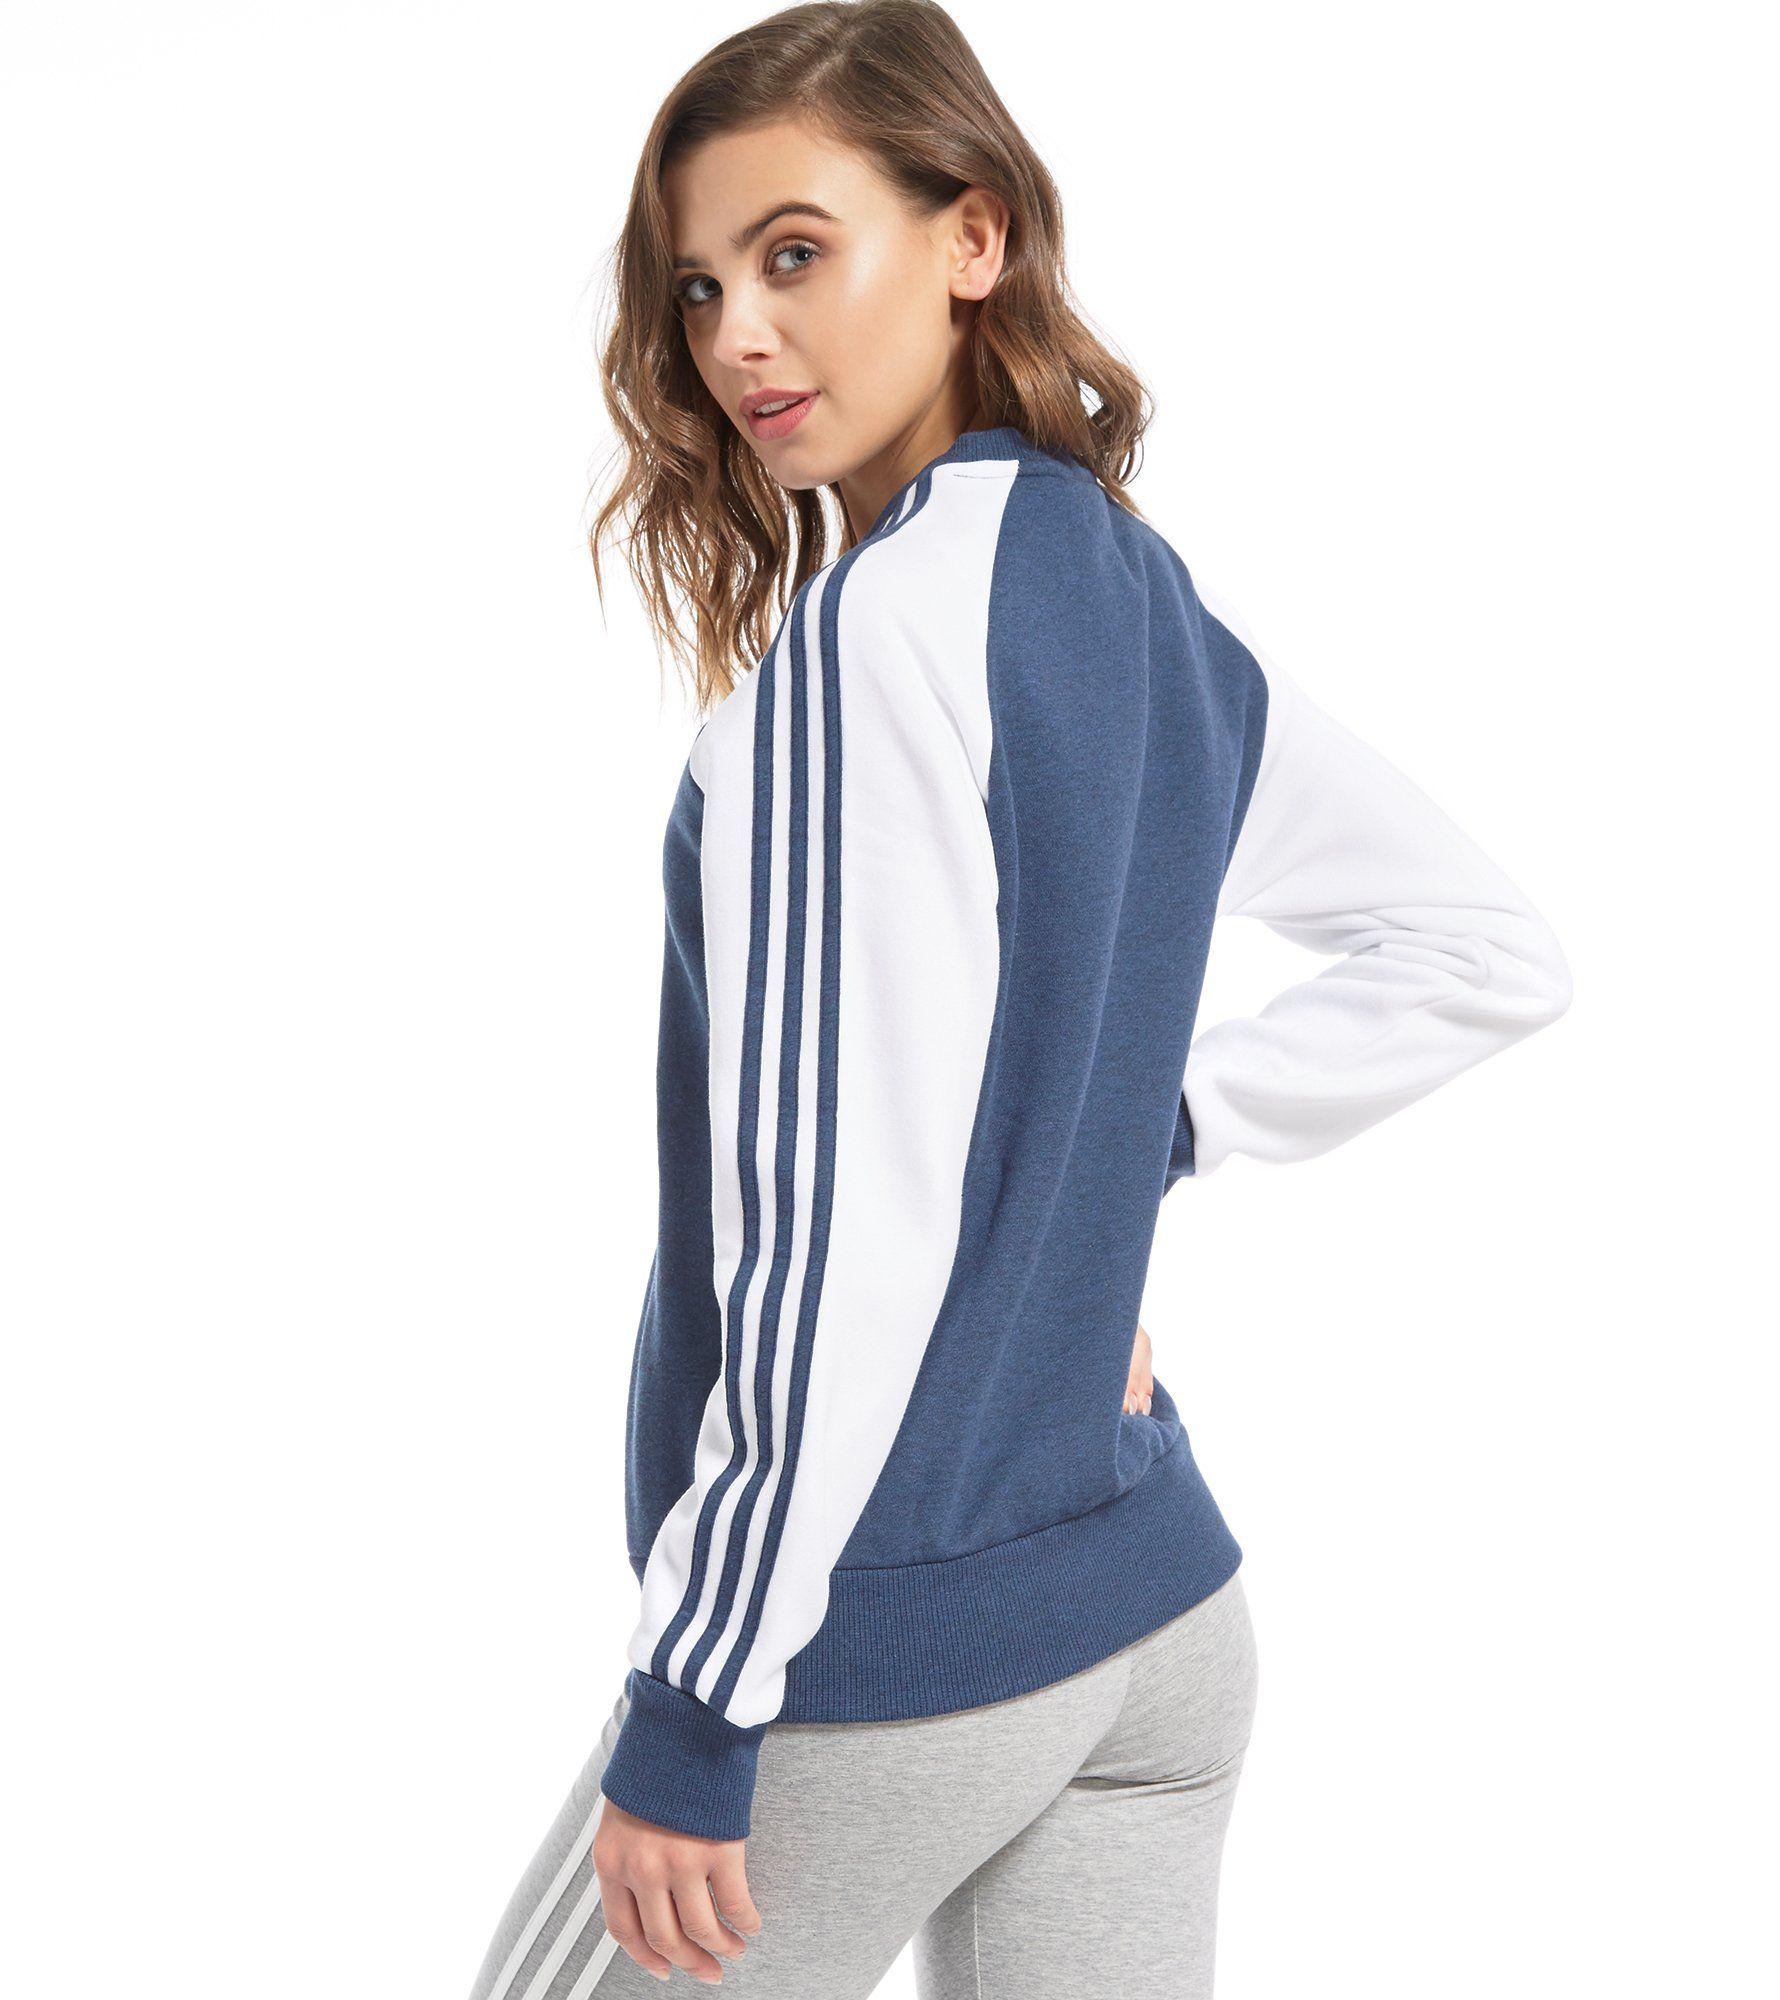 adidas Originals Trefoil Infill Crew Sweatshirt